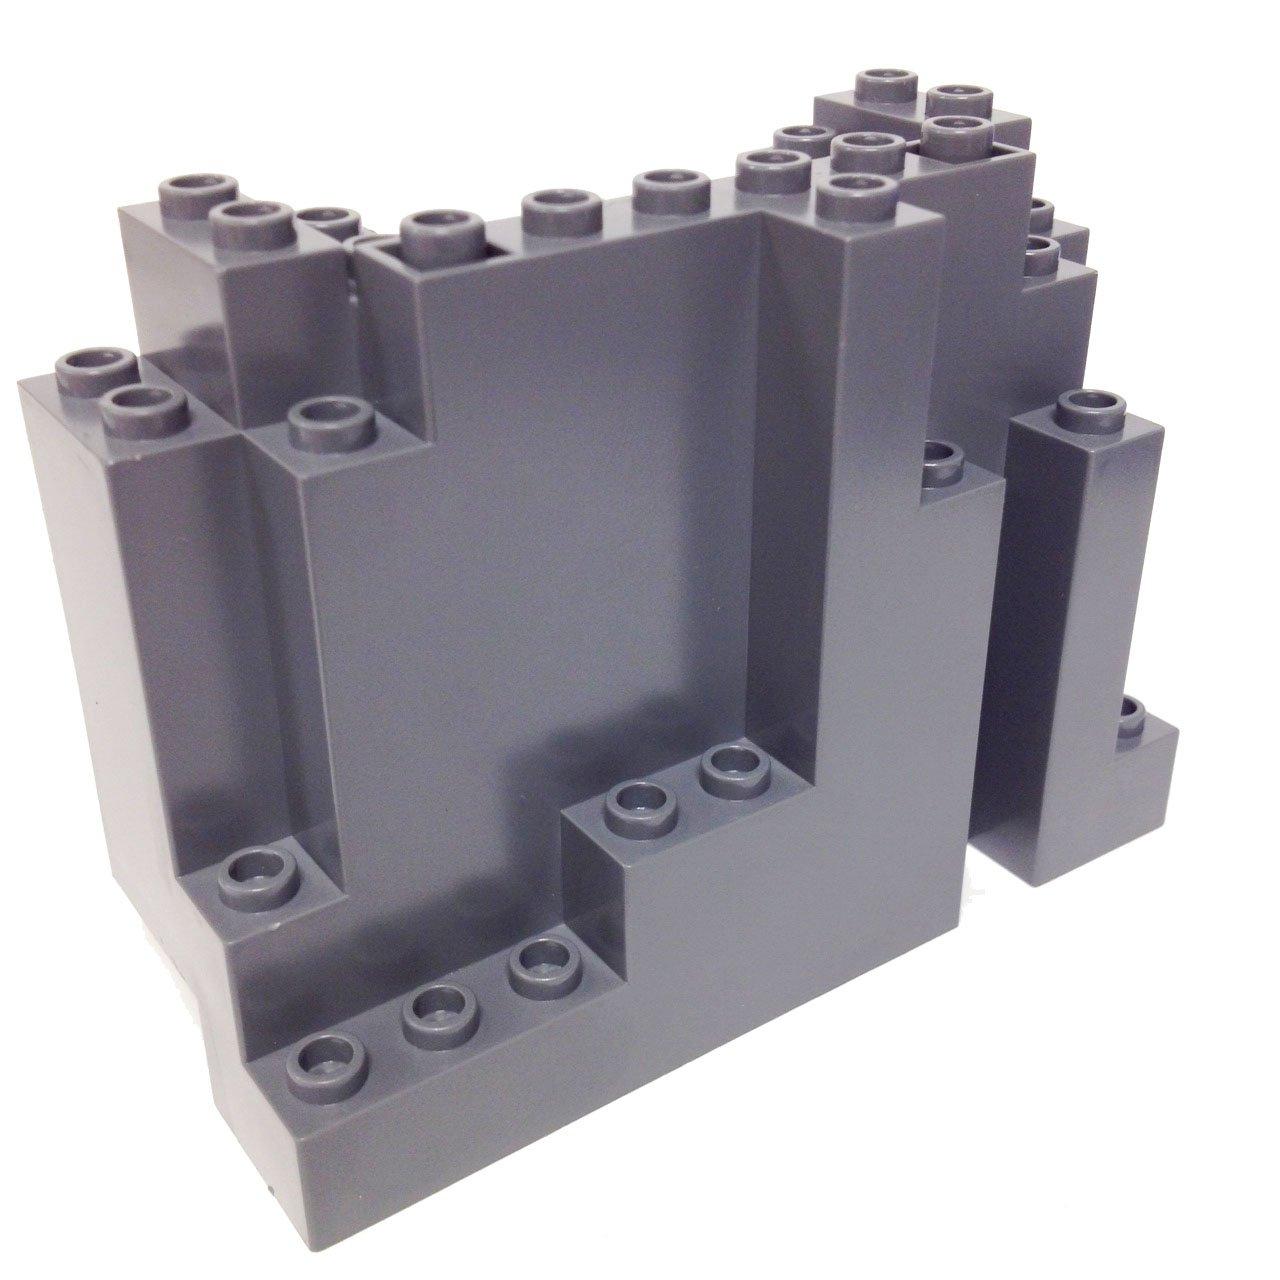 Lego Parts Mountain Brick 4 X 10 6 Rock Panel Skeleton Tower 7093 Rectangular Burp Dbgray Toys Games